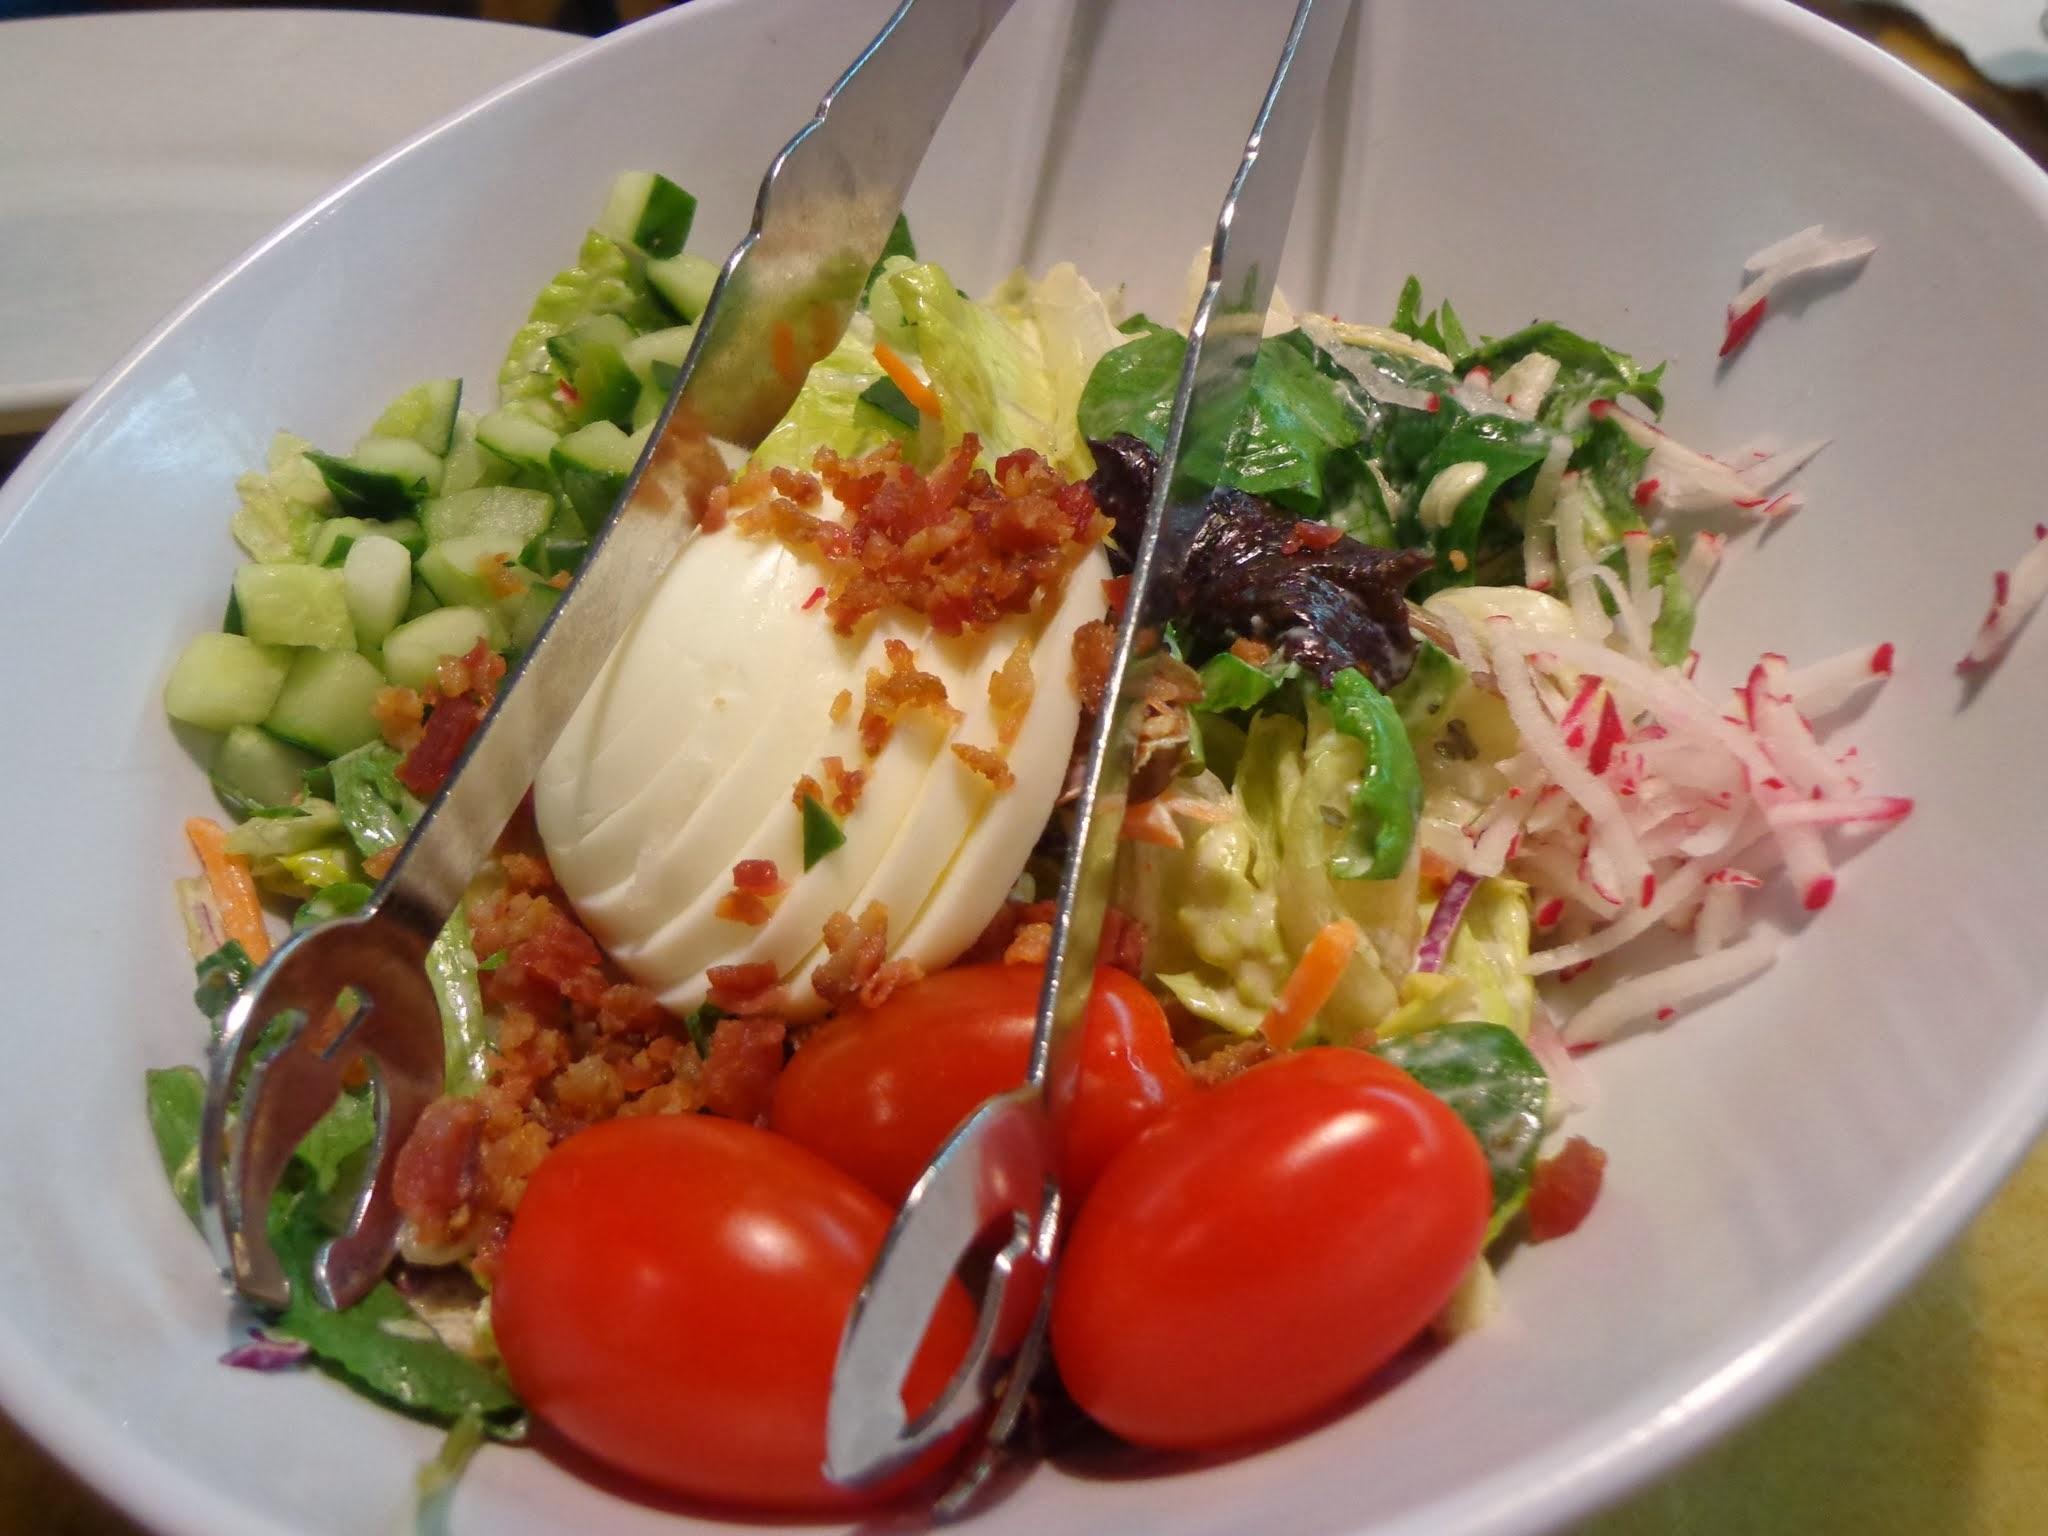 GG_Salad.JPG